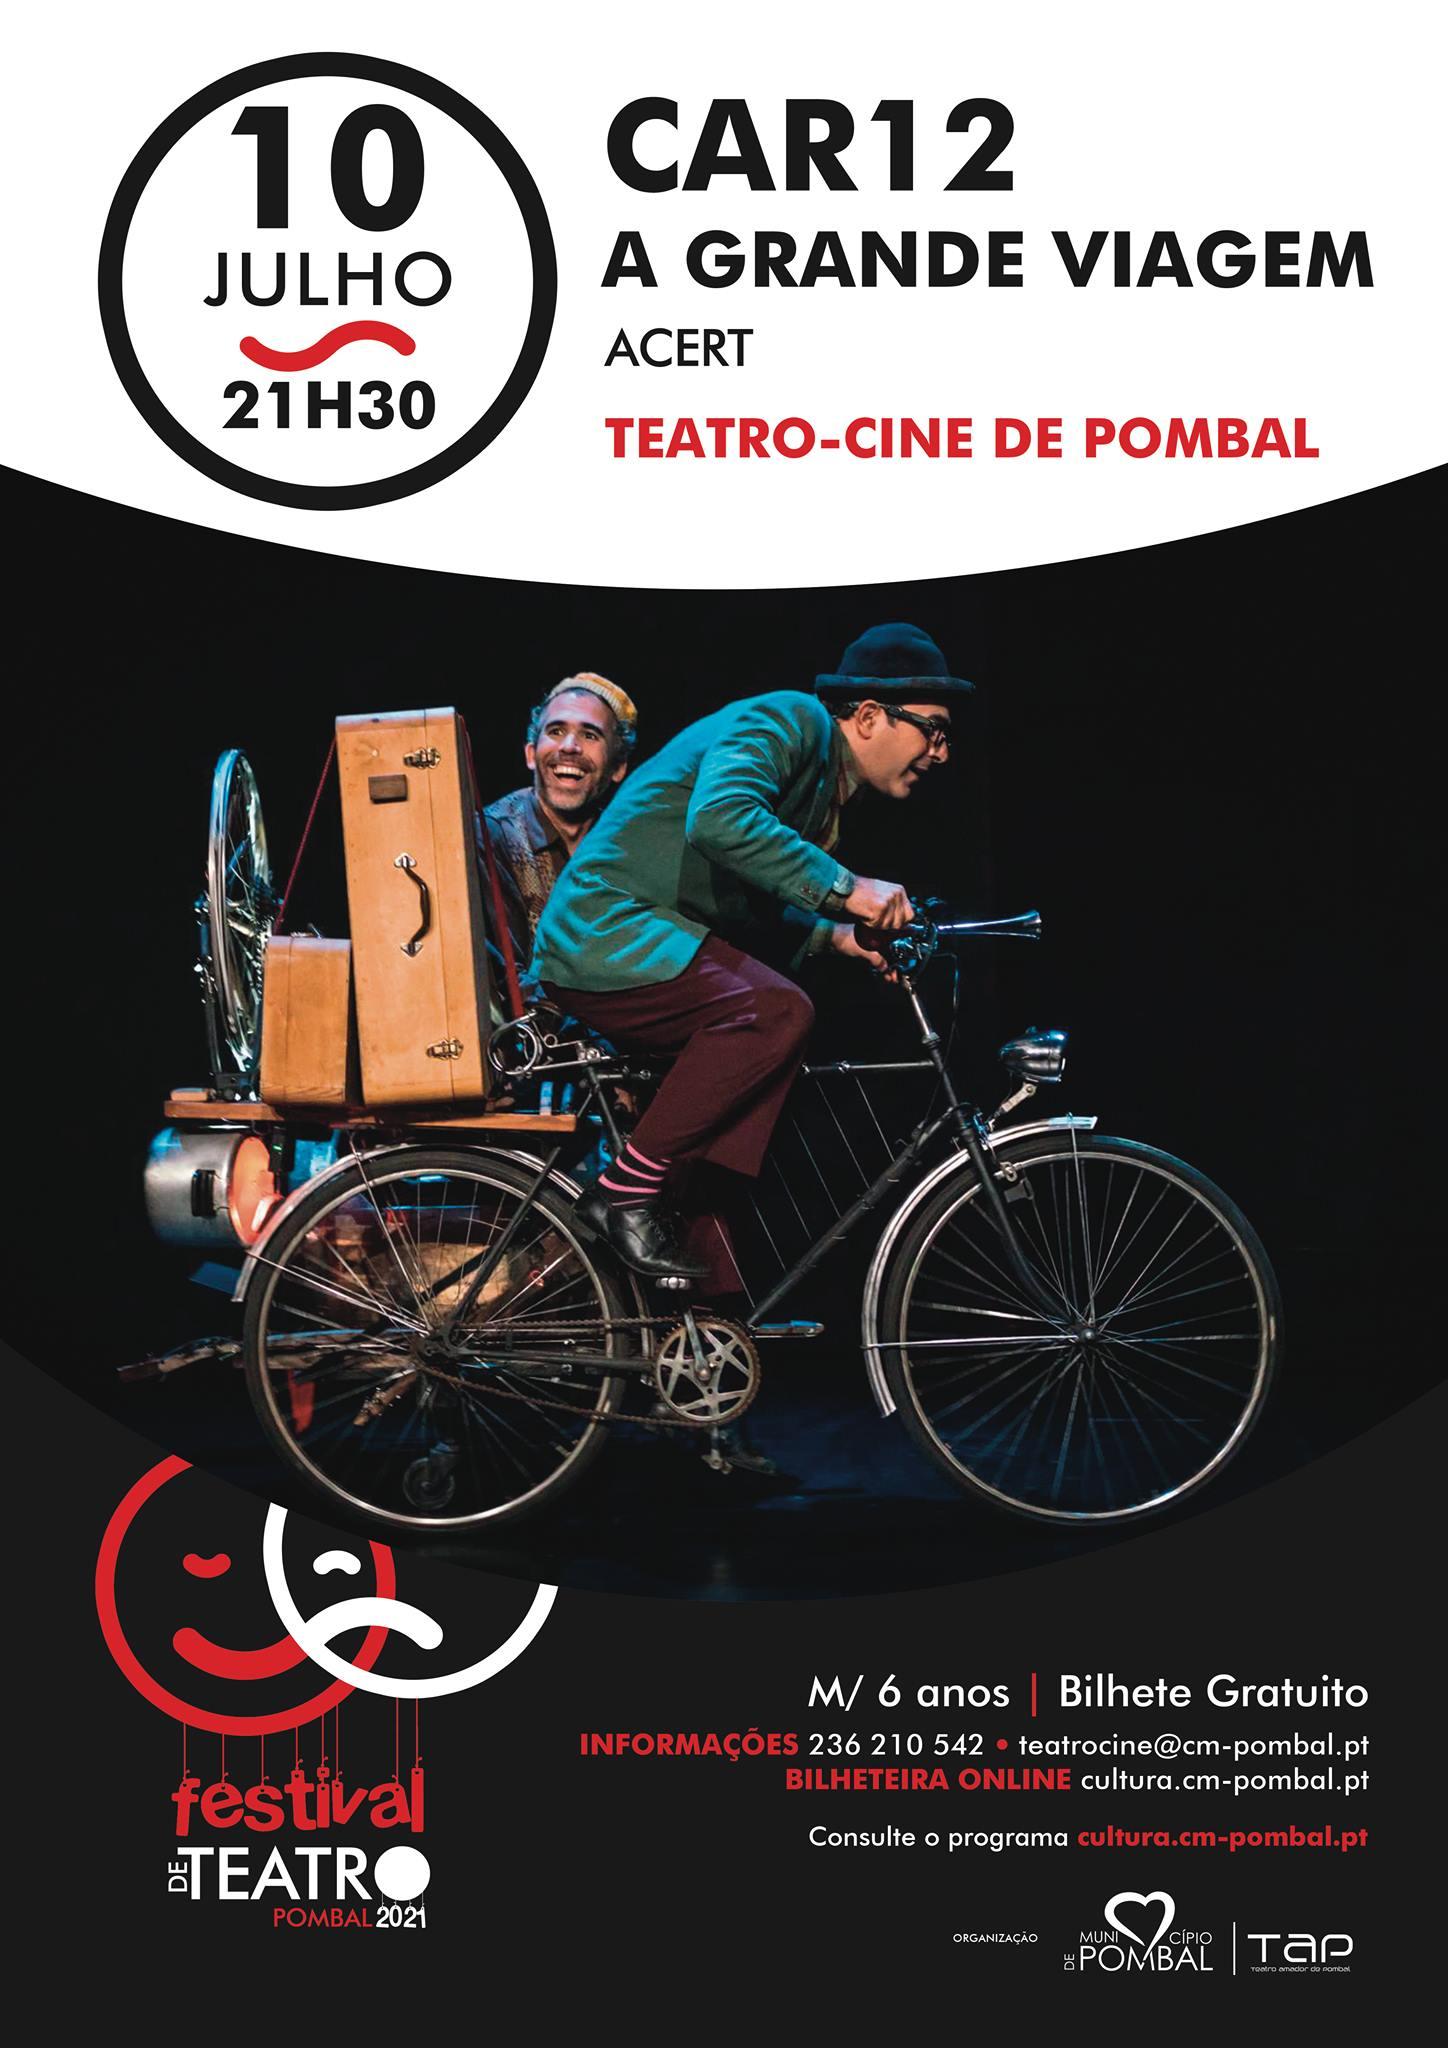 Festival de Teatro - Car12